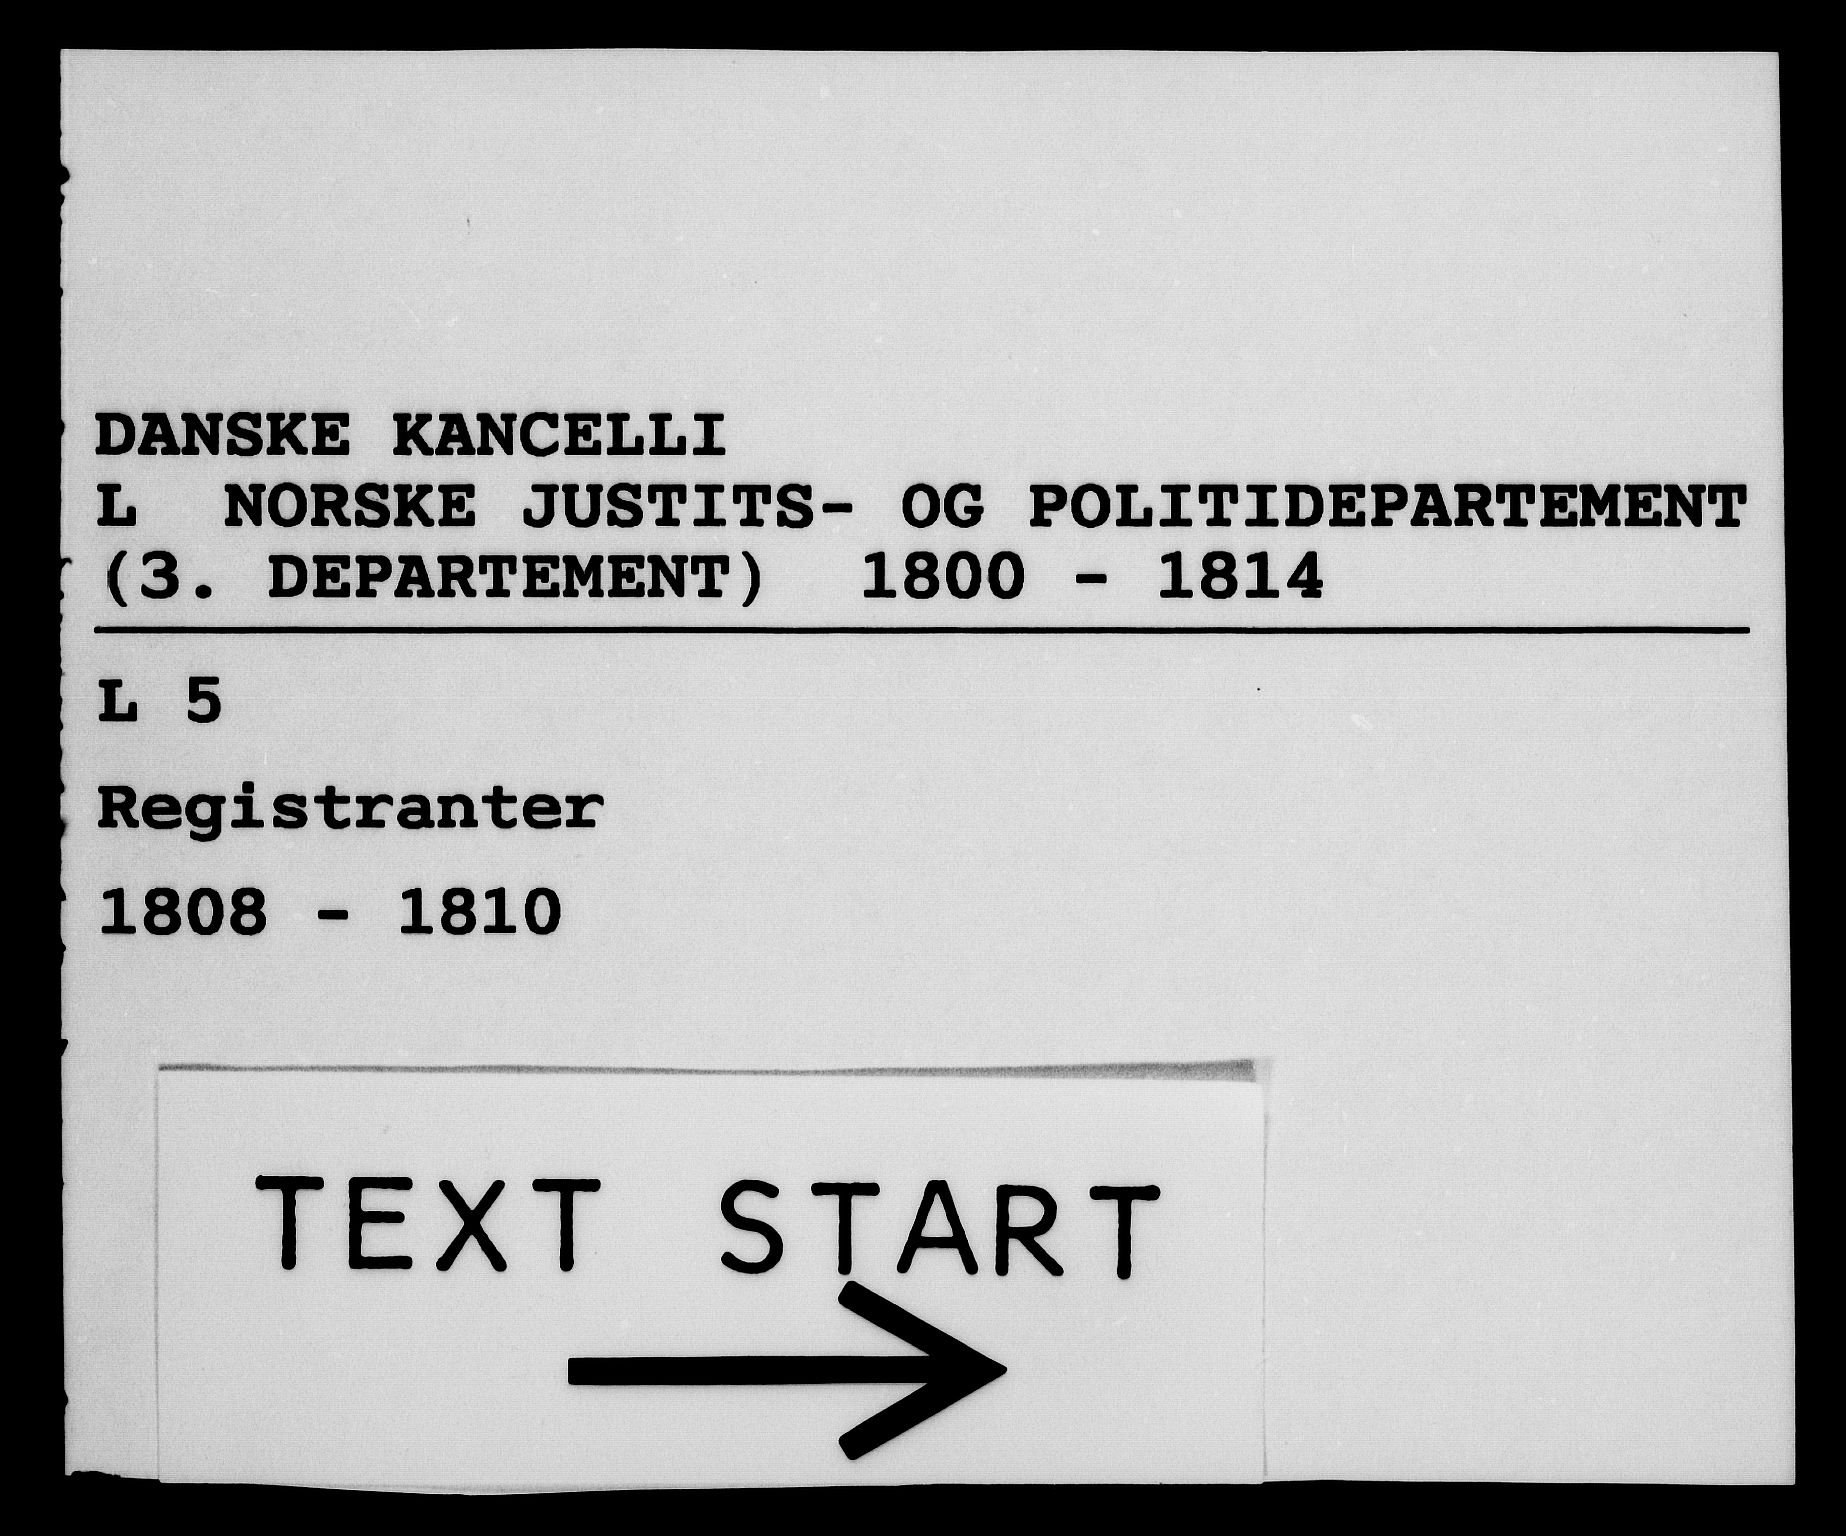 RA, Danske Kanselli 1800-1814, H/Hf/Hfb/Hfba/L0004: Registranter, 1808-1810